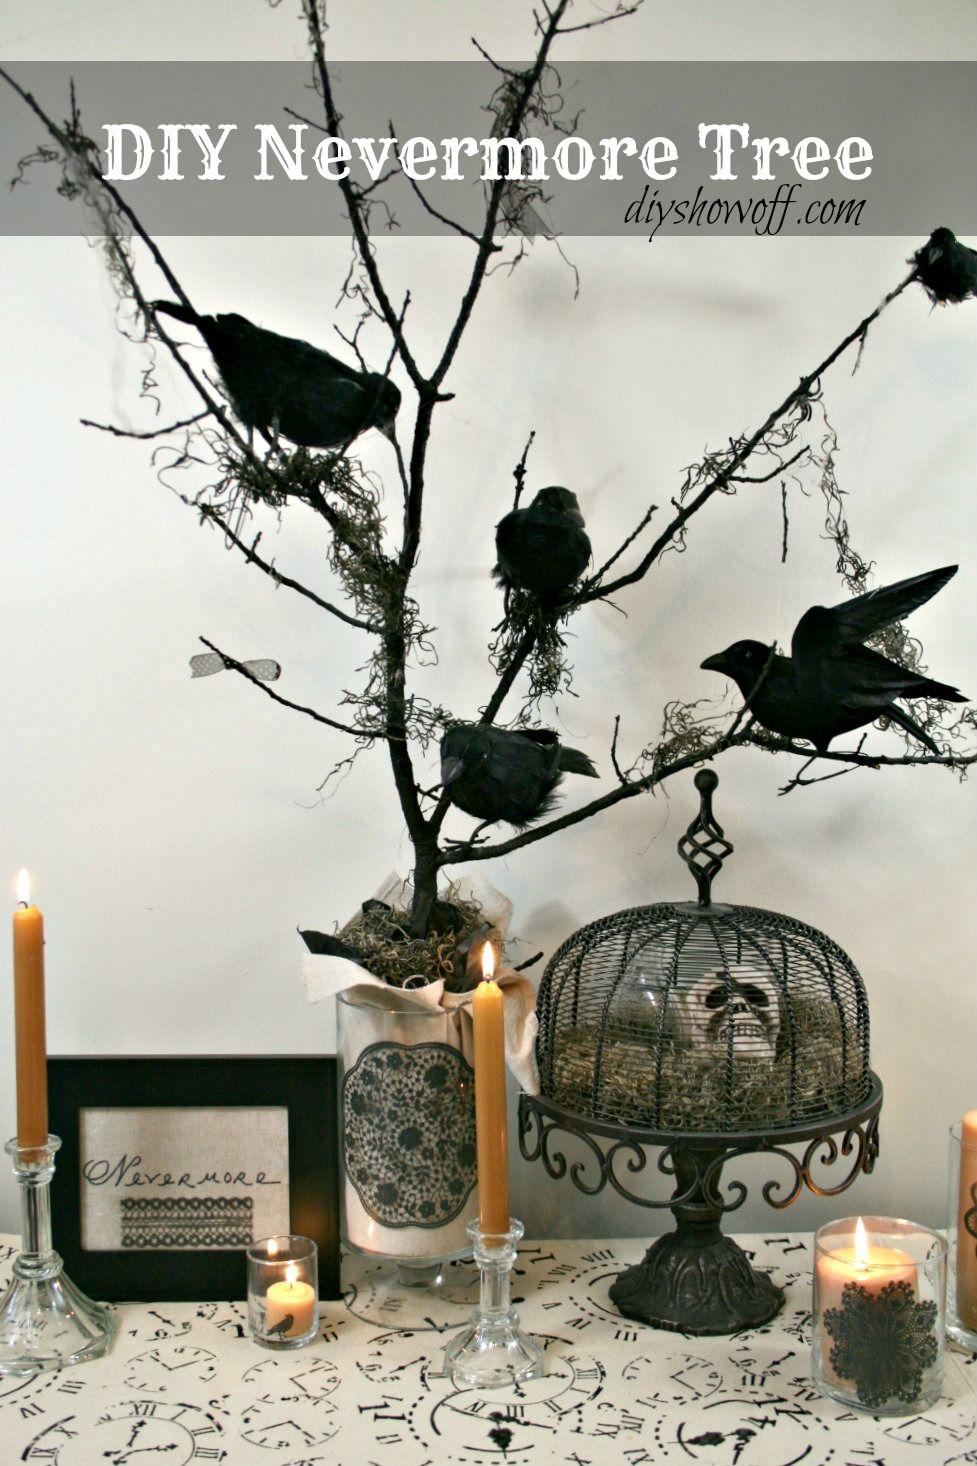 Diy Halloween Nevermore Tree Decor Linkie Parties